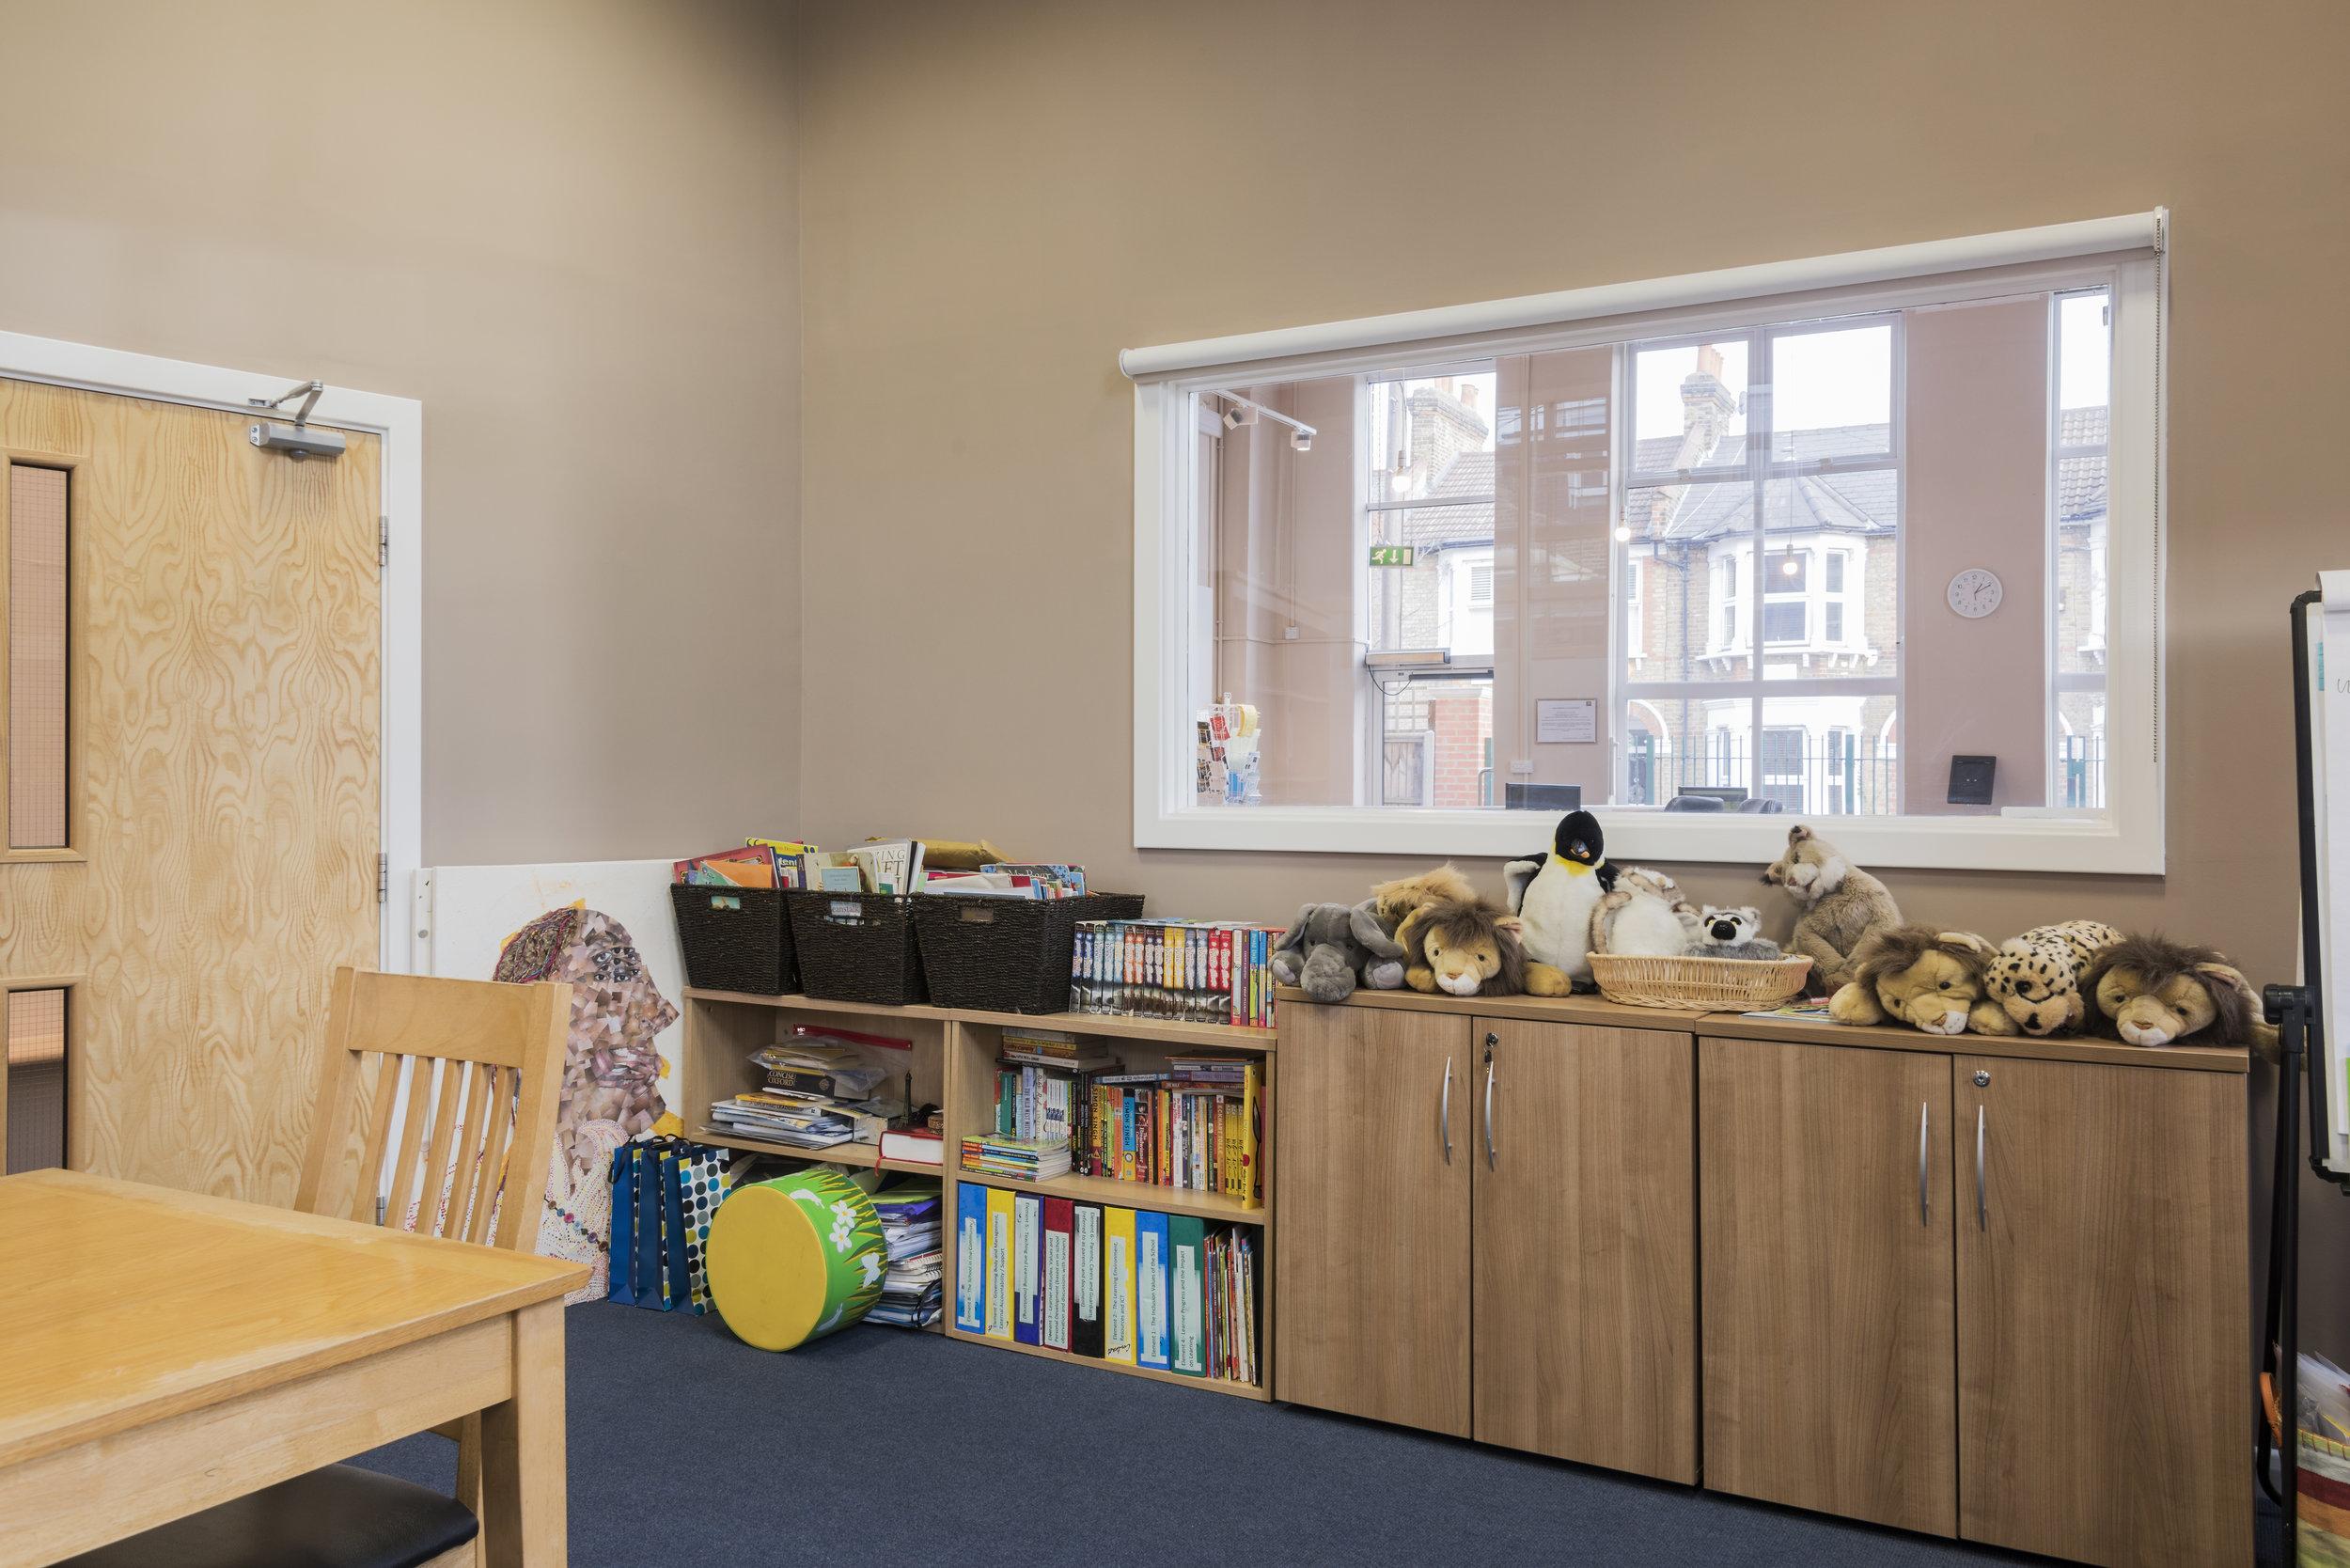 Head teacher office and meeting room